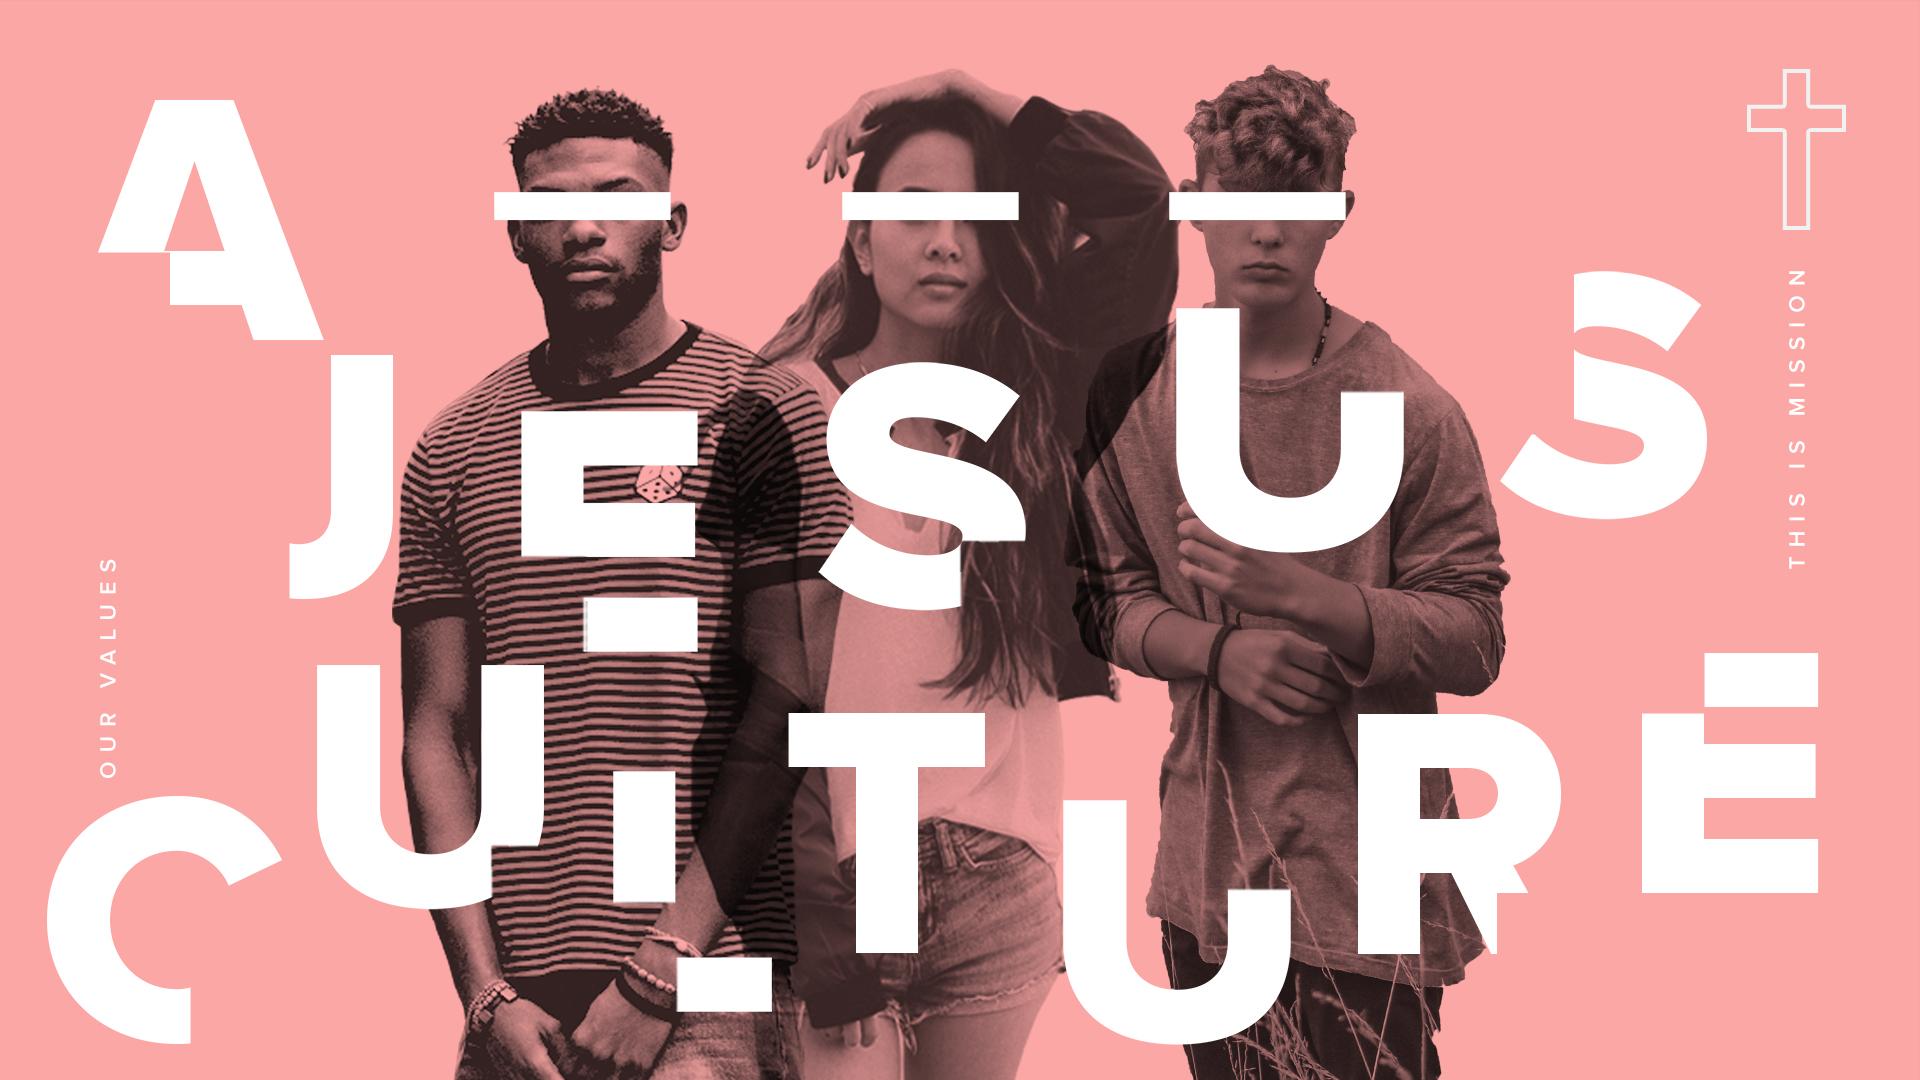 A Jesus Culture - Title.jpg